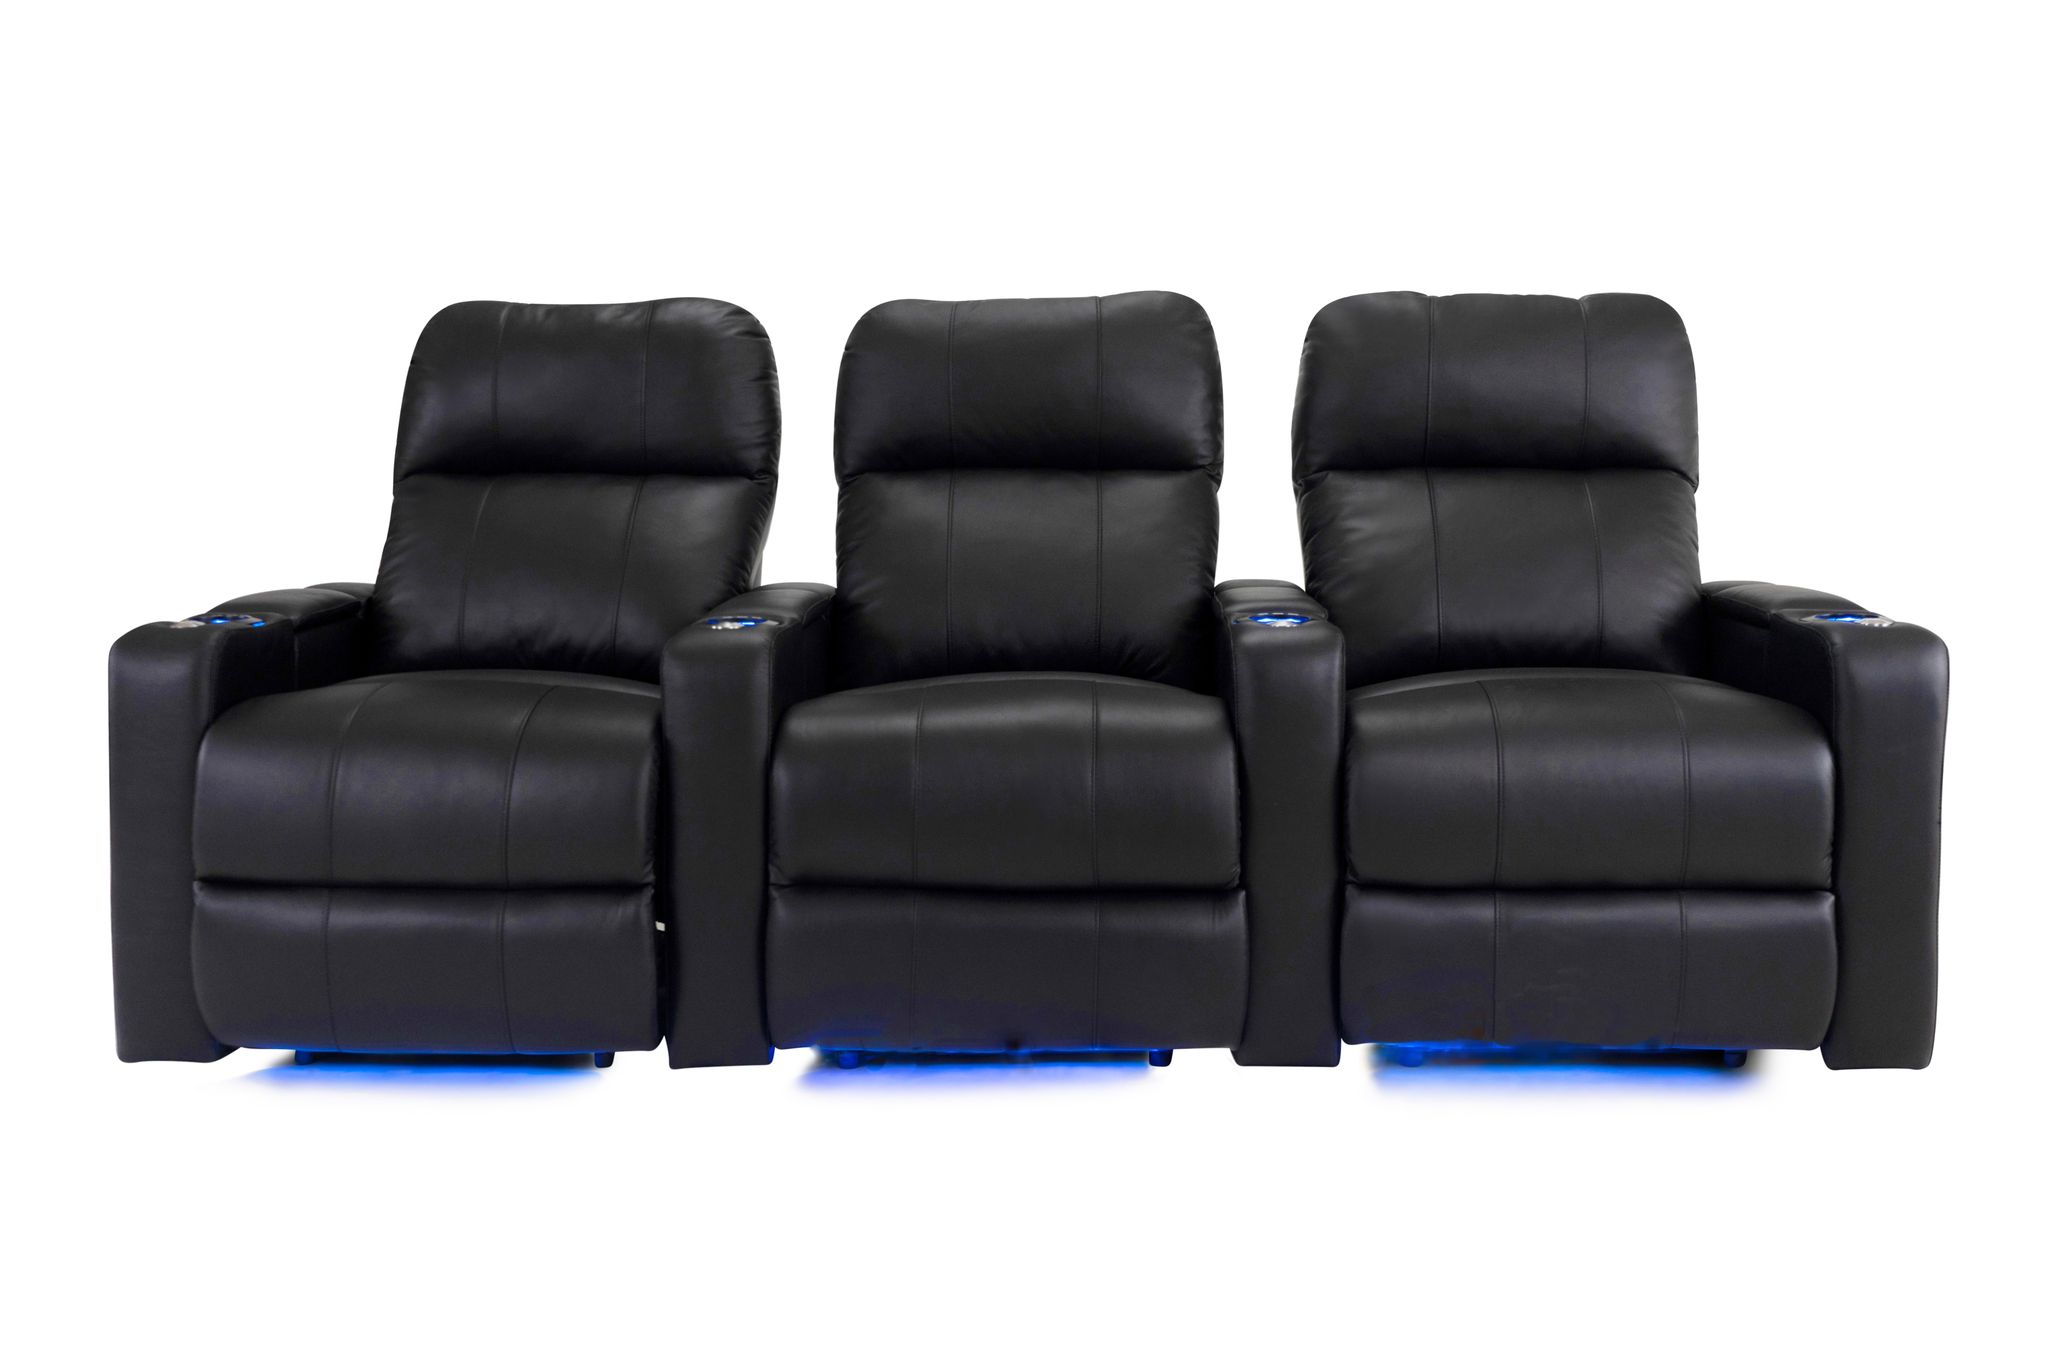 3 Chair Straight Row